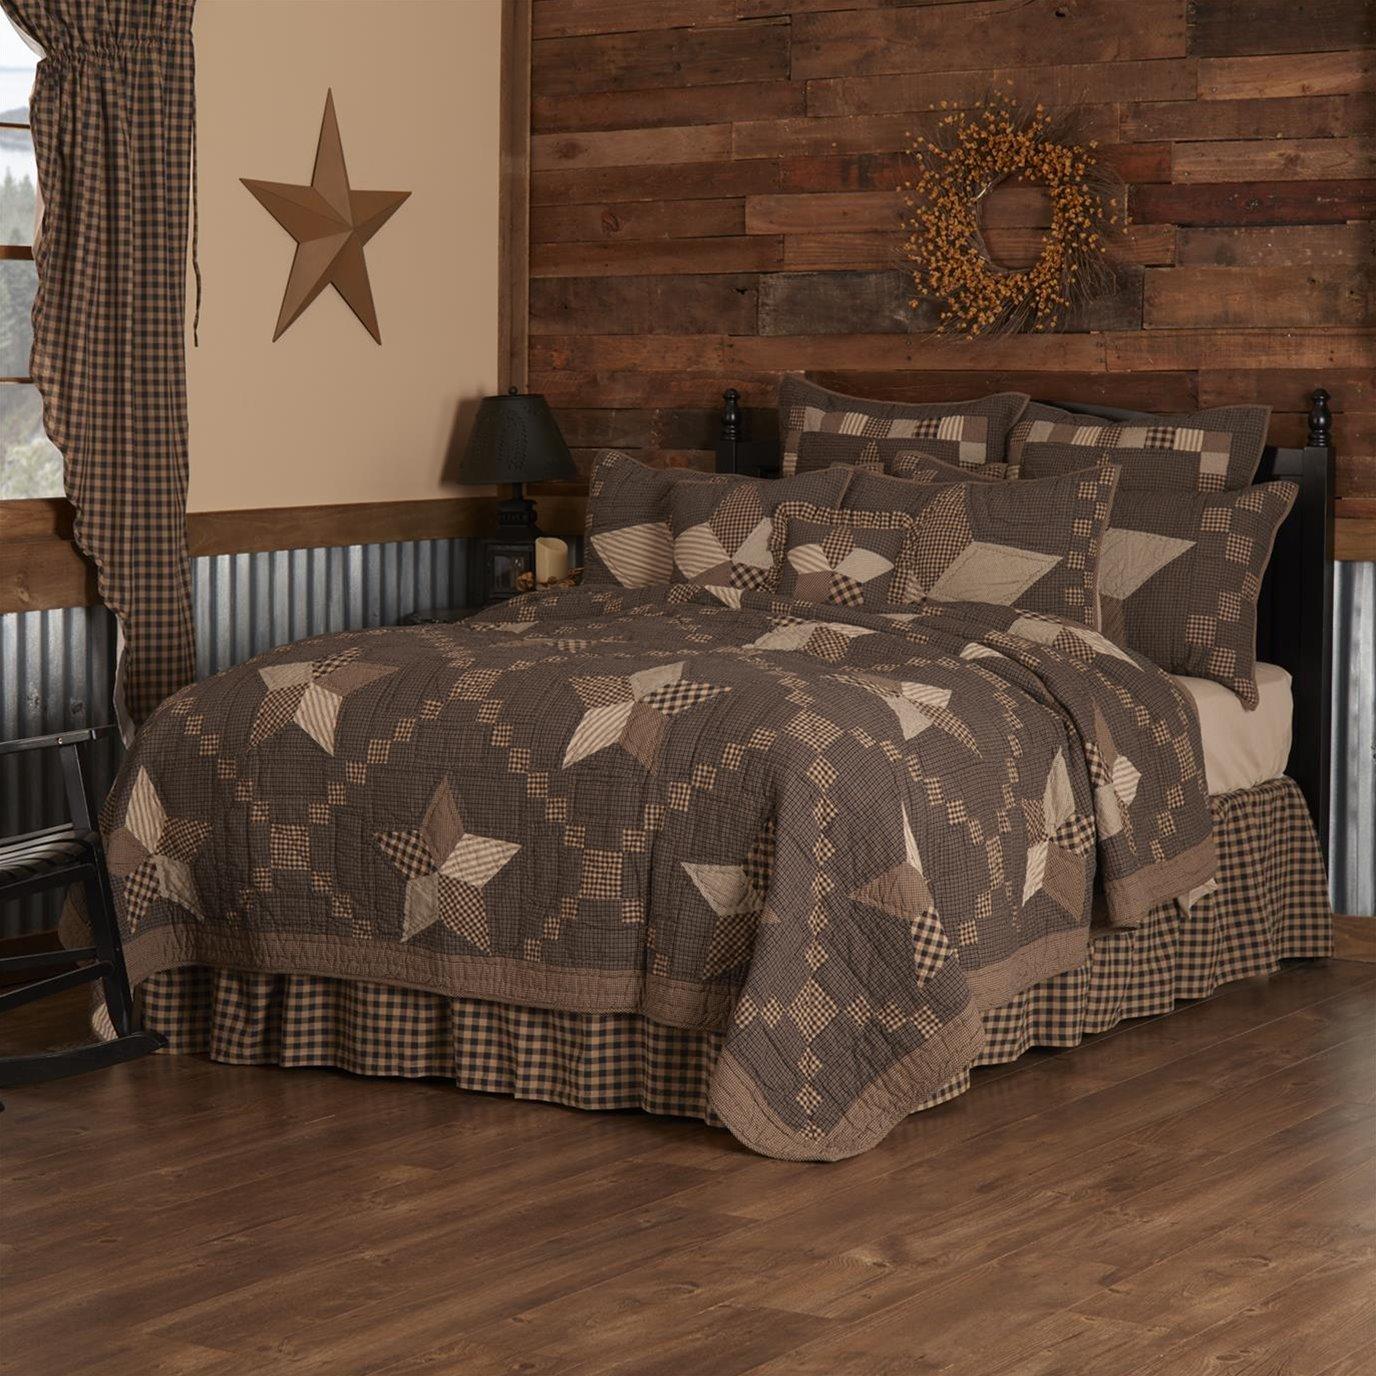 Farmhouse Star Luxury King Quilt 120Wx105L